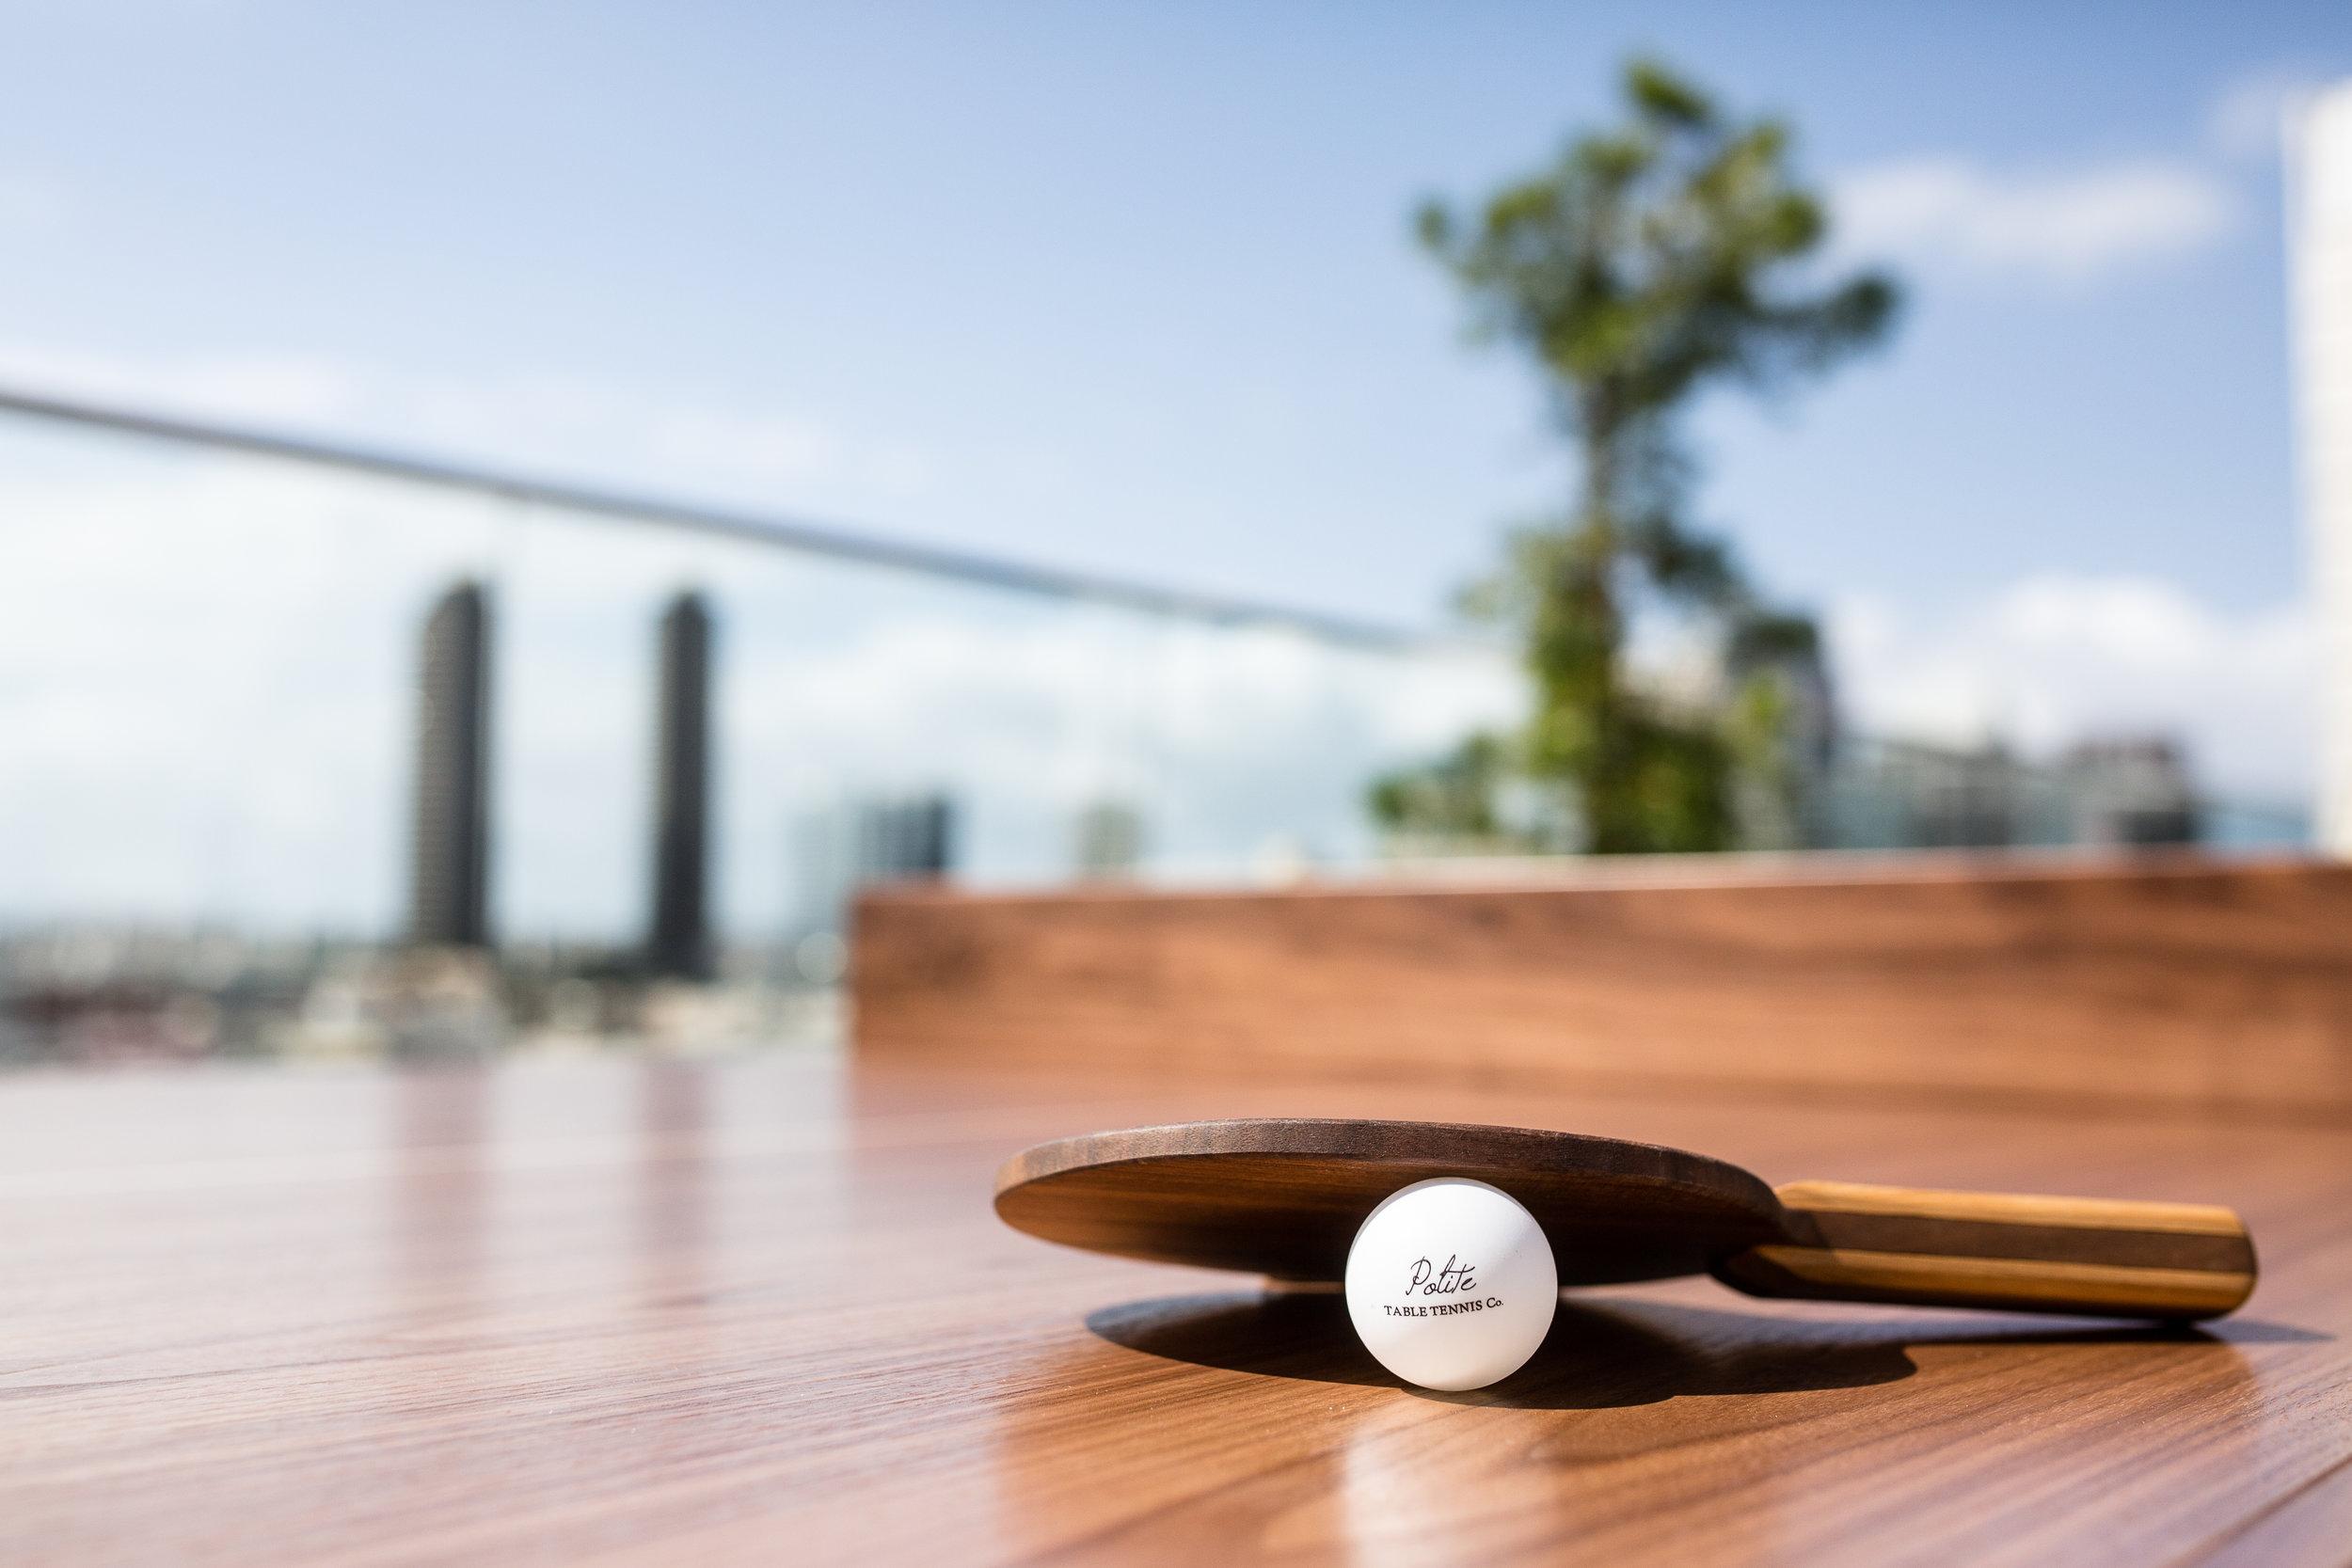 20170922_Polite Table Tennis-0022.jpg